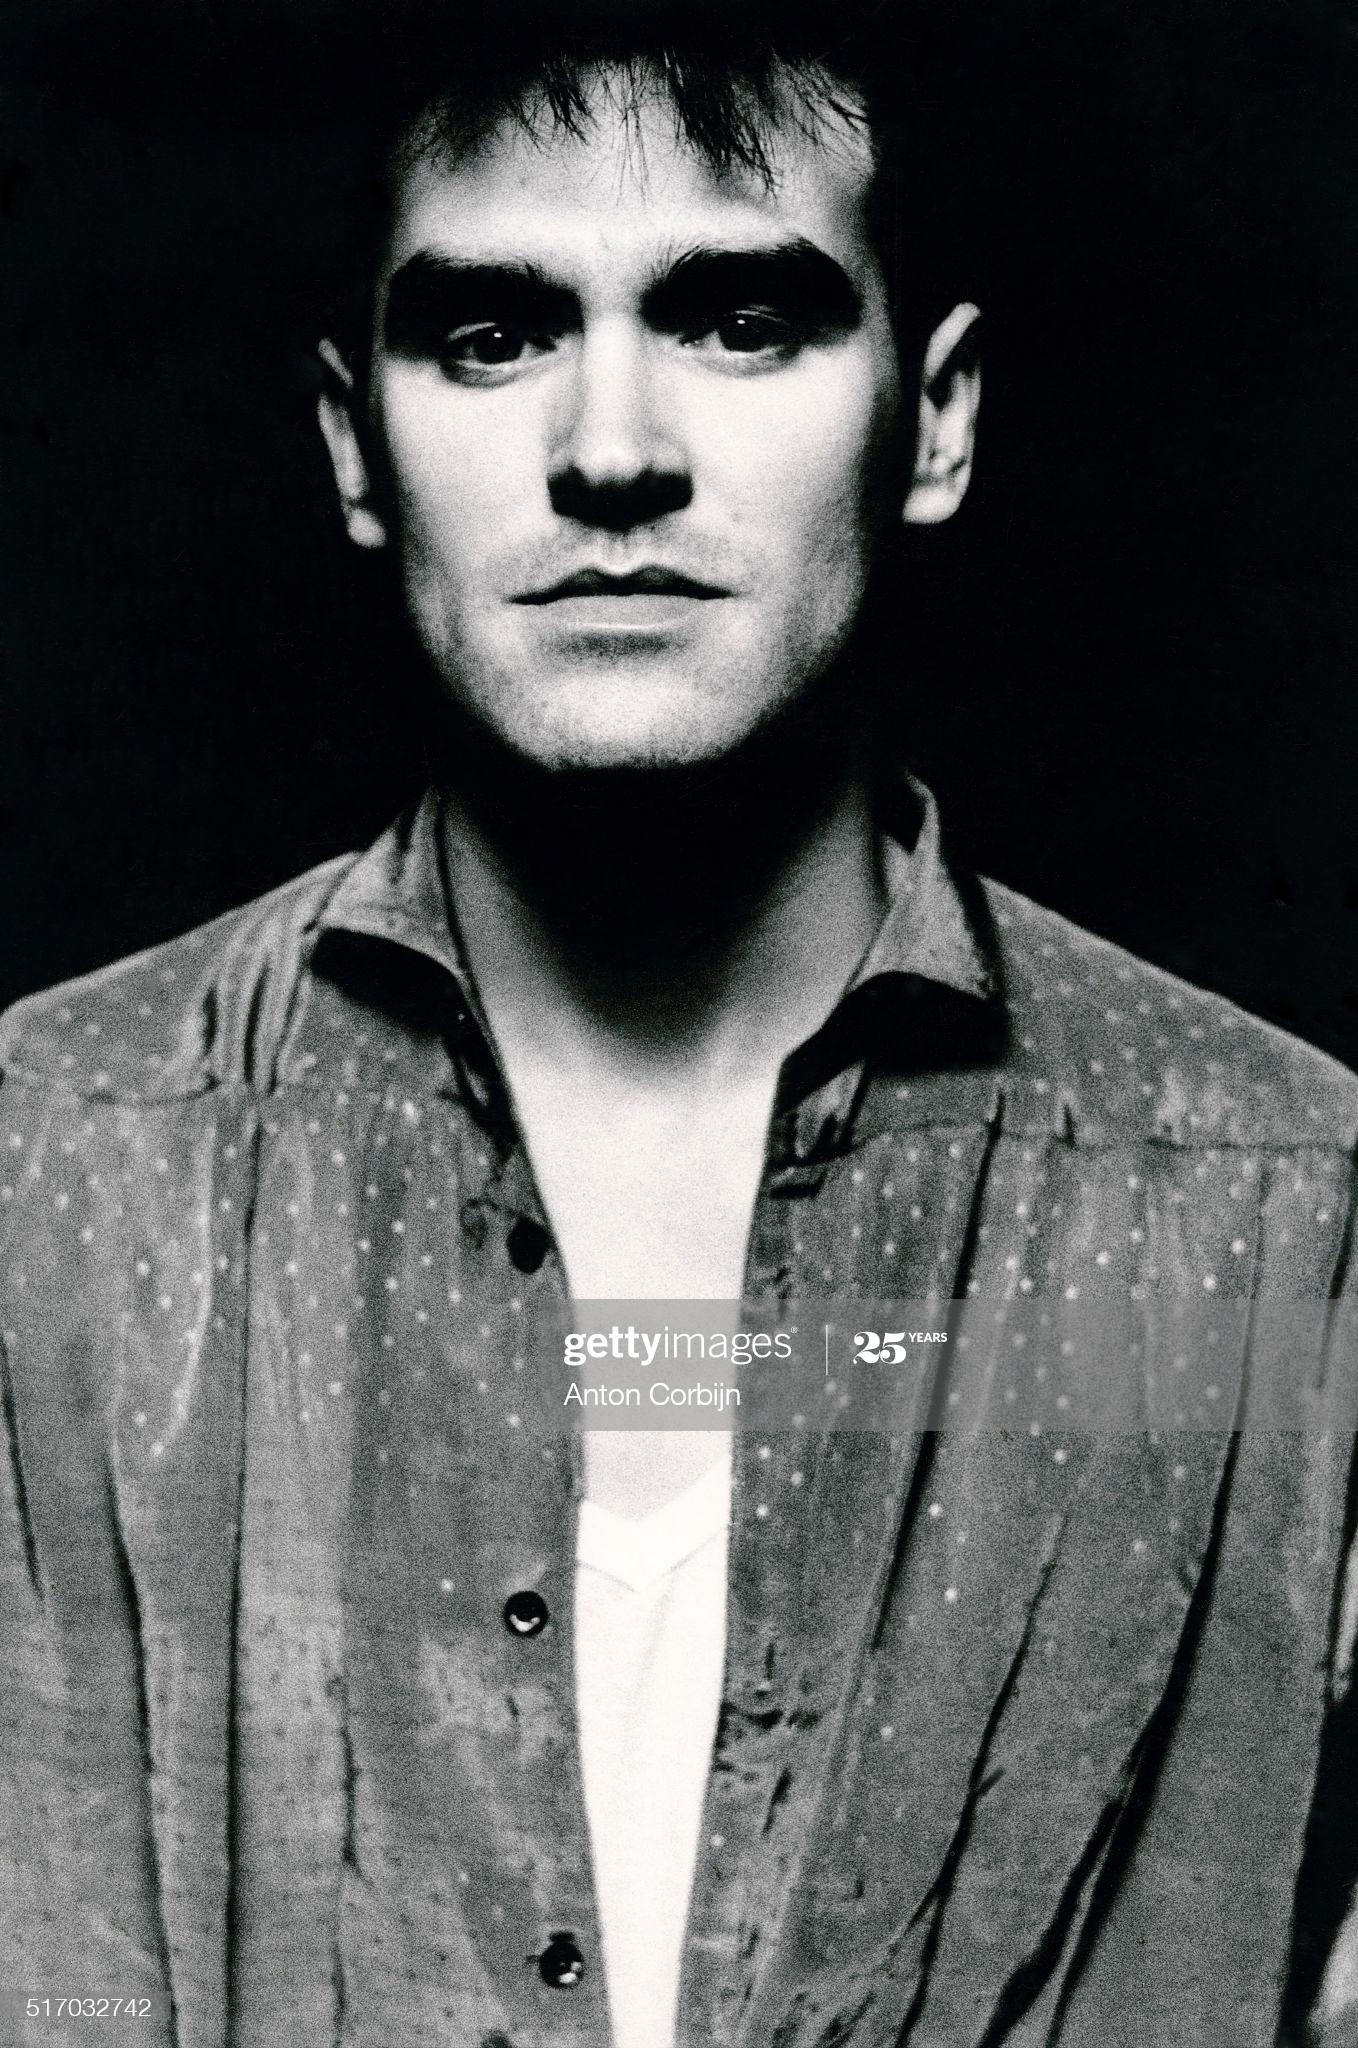 Morrissey, Liverpool, 23rd January 1984 (i) ~ Anton Corbijn.jpg